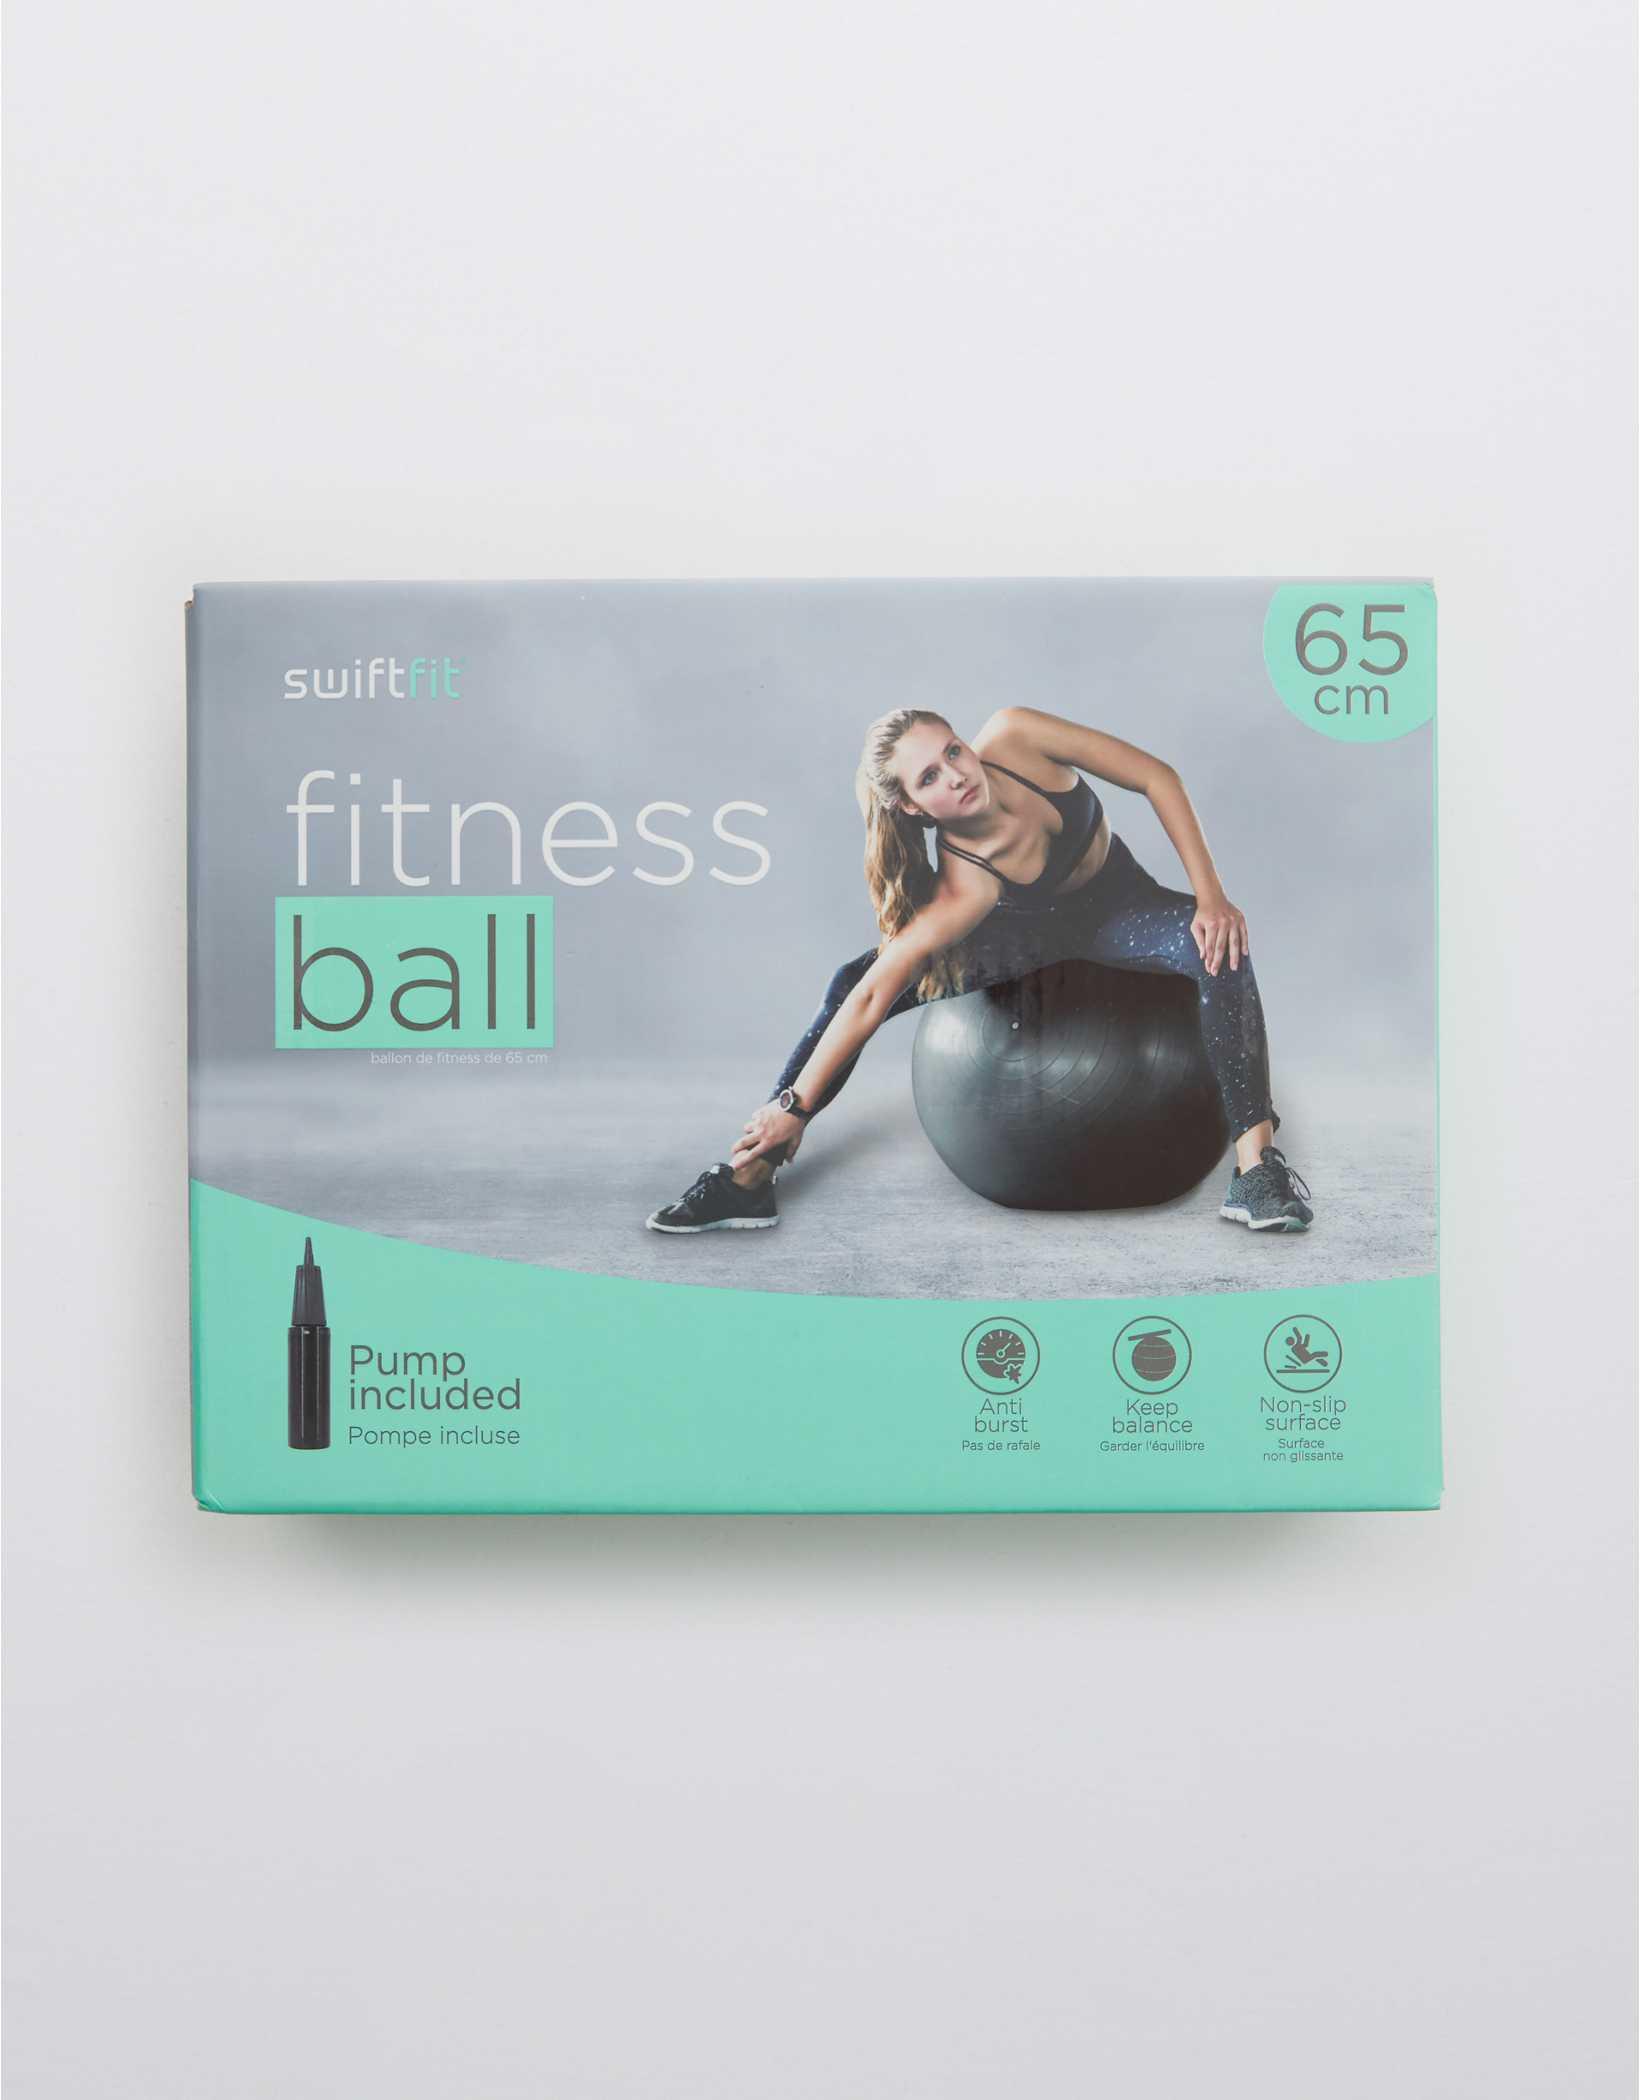 Swiftfit Fitness Ball